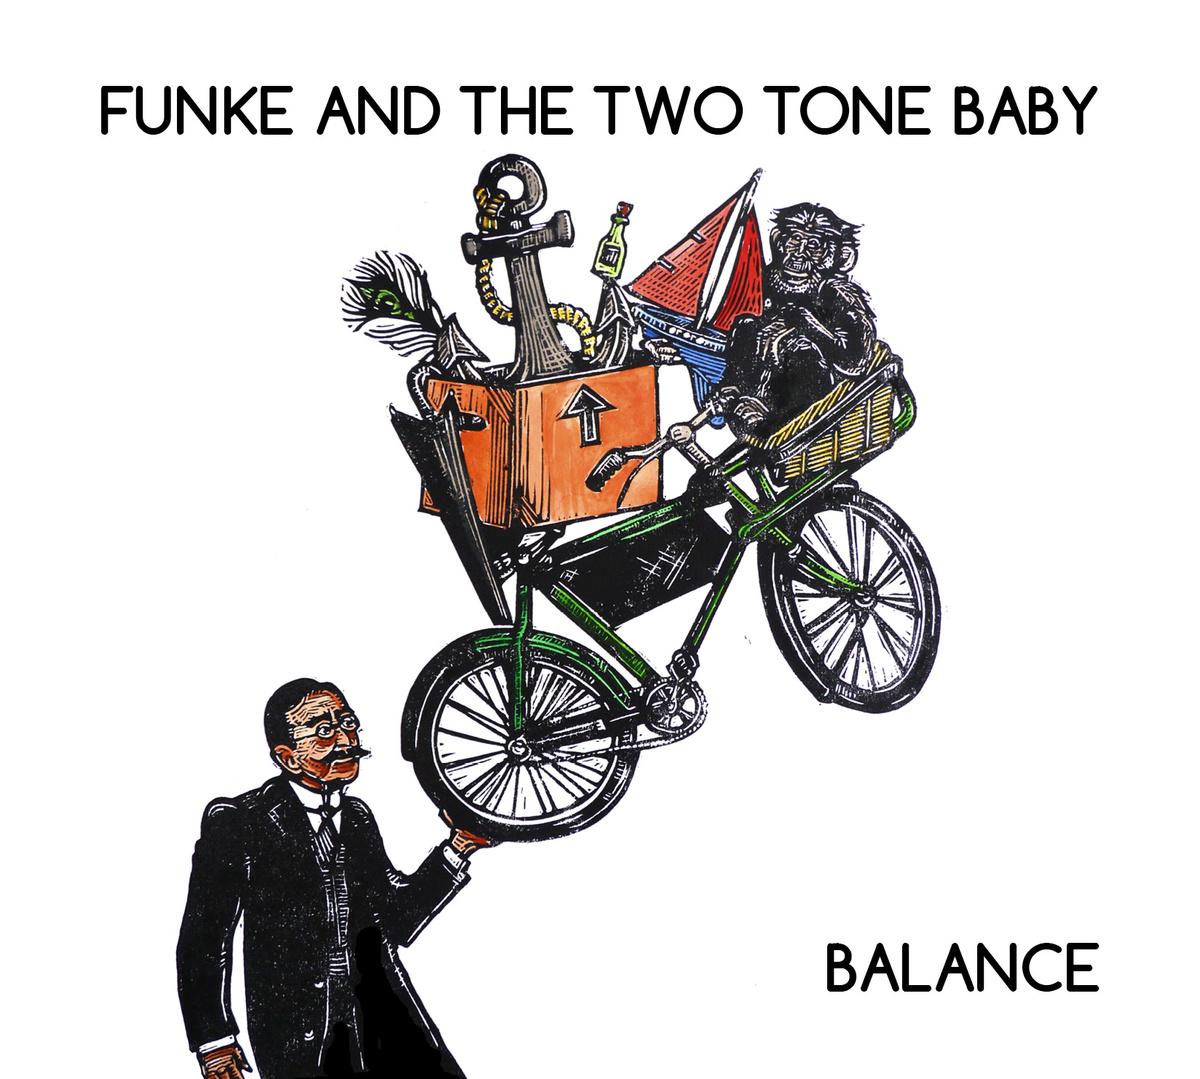 Funke and The Two Tone Baby – Balance